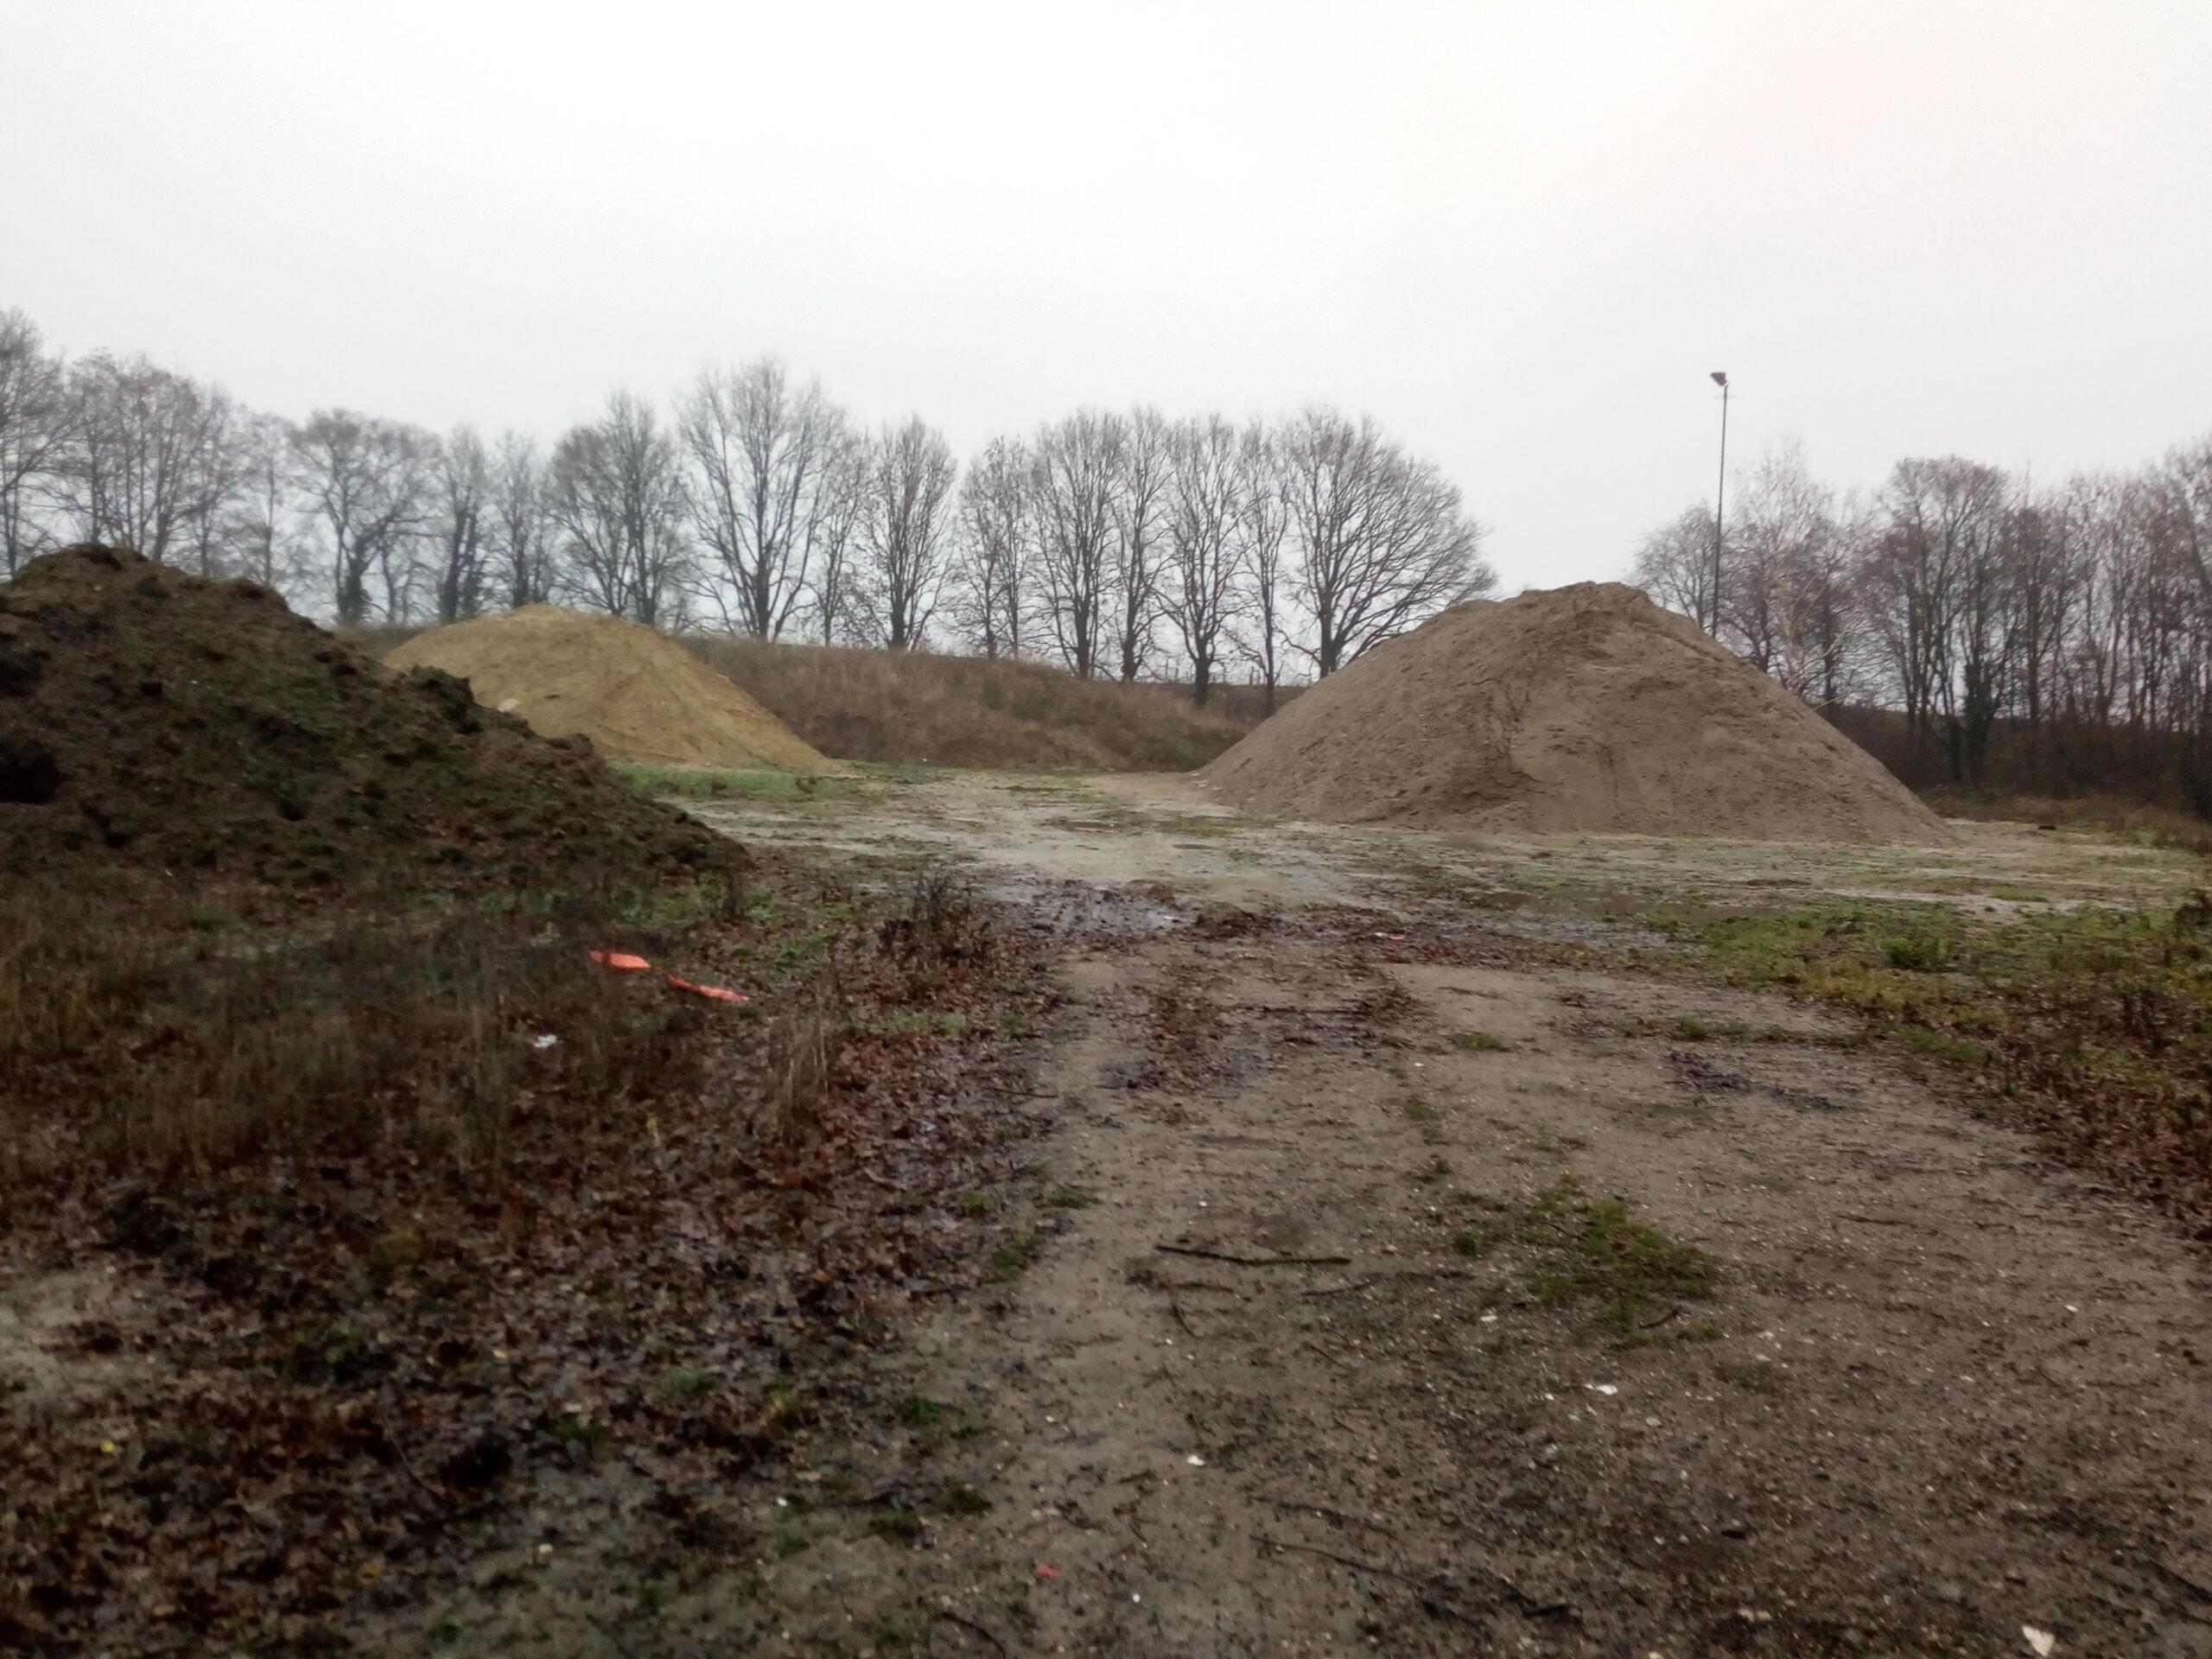 Braakliggend stuk grond